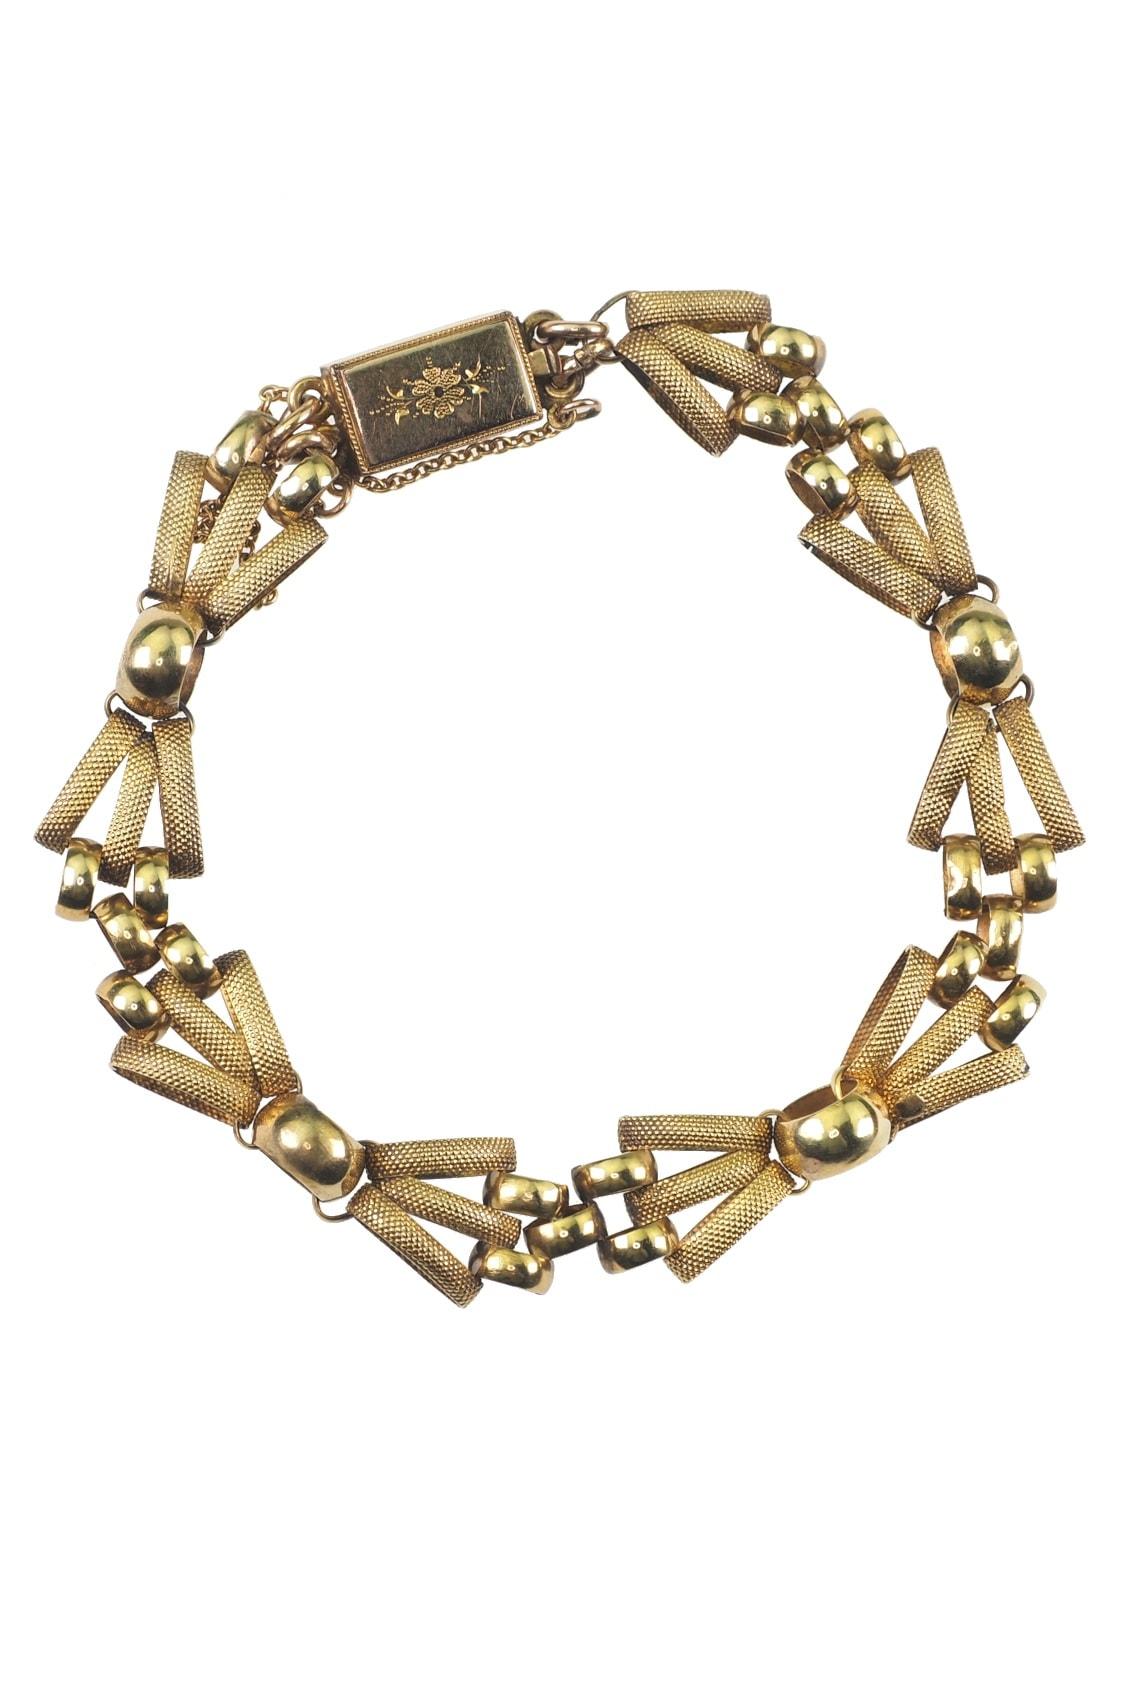 antikes-Gelbgoldarmband-kaufen-2839